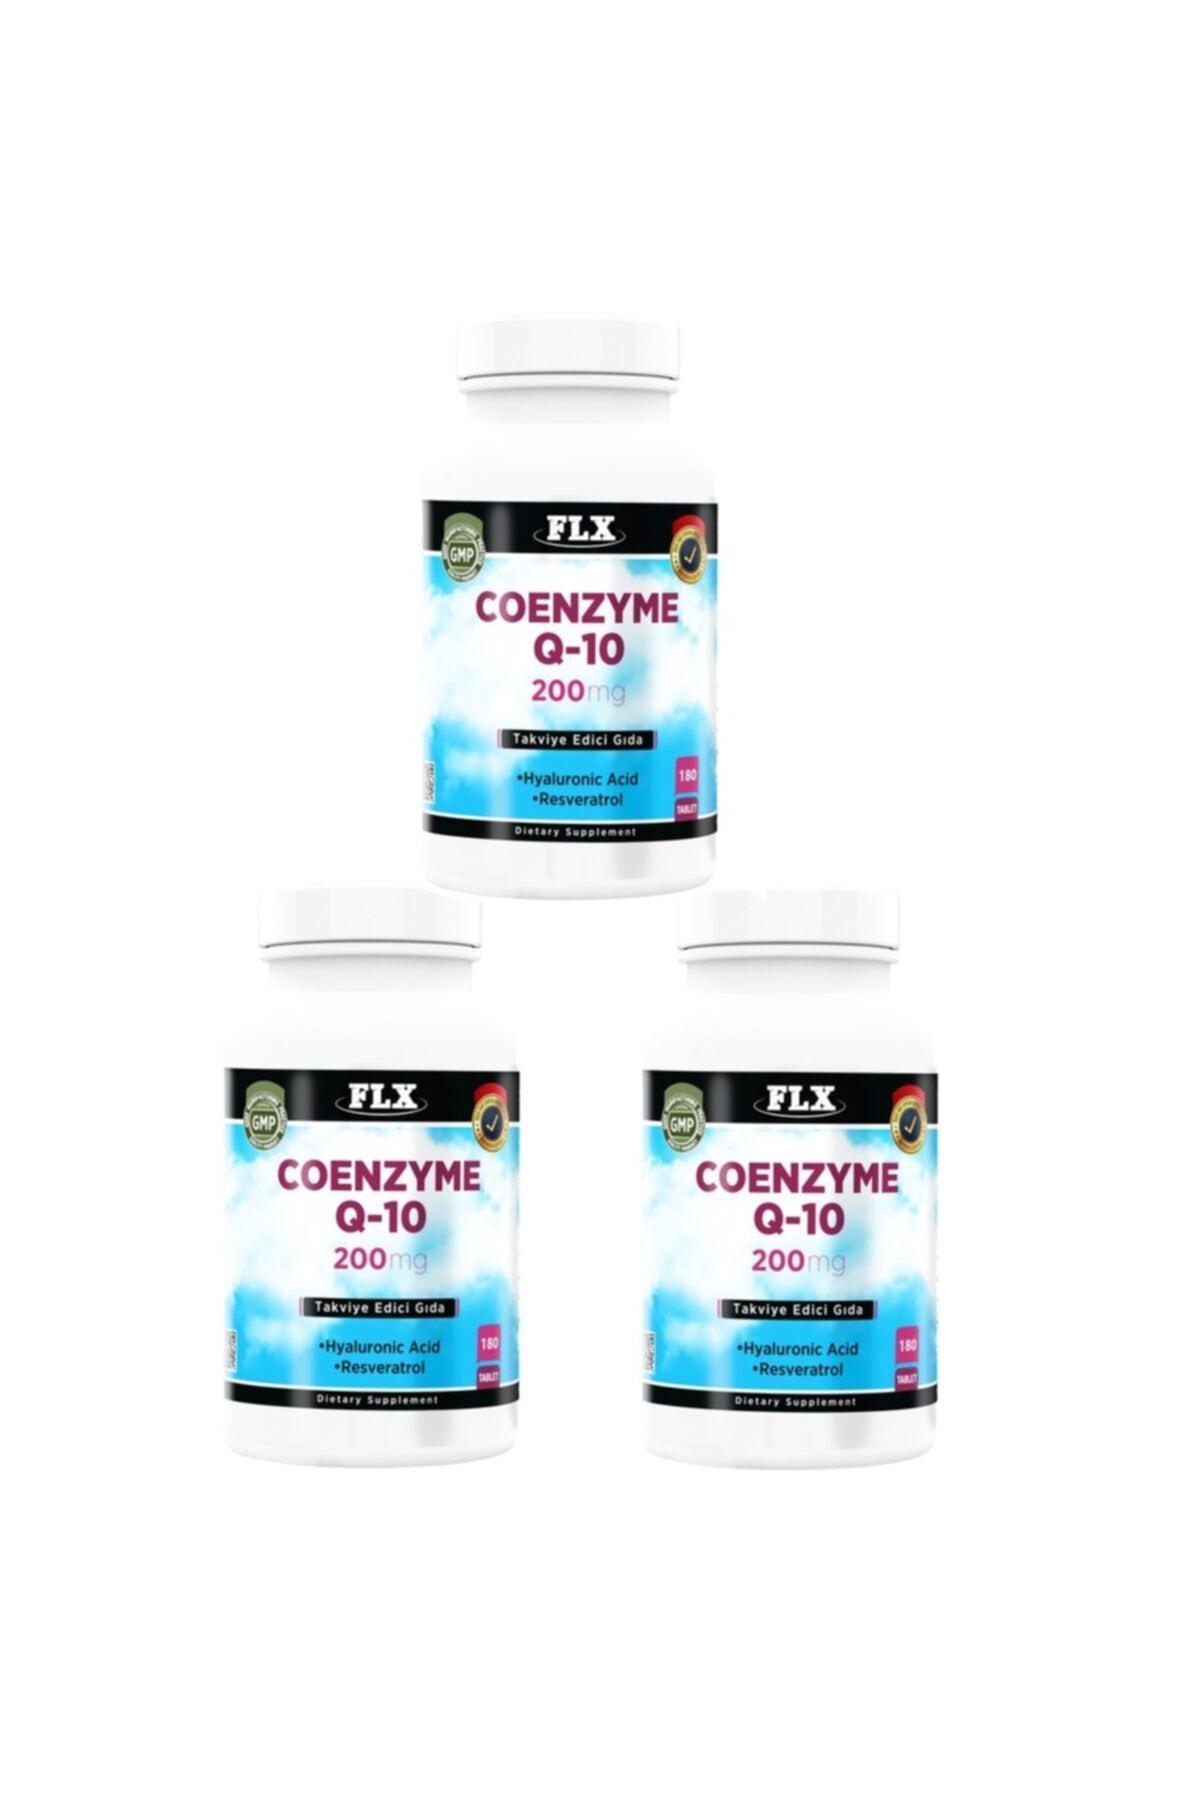 FLX Coenzyme Q-10 200 Mg Hyaluronik Asit 180 Tablet X 3 Kutu 1